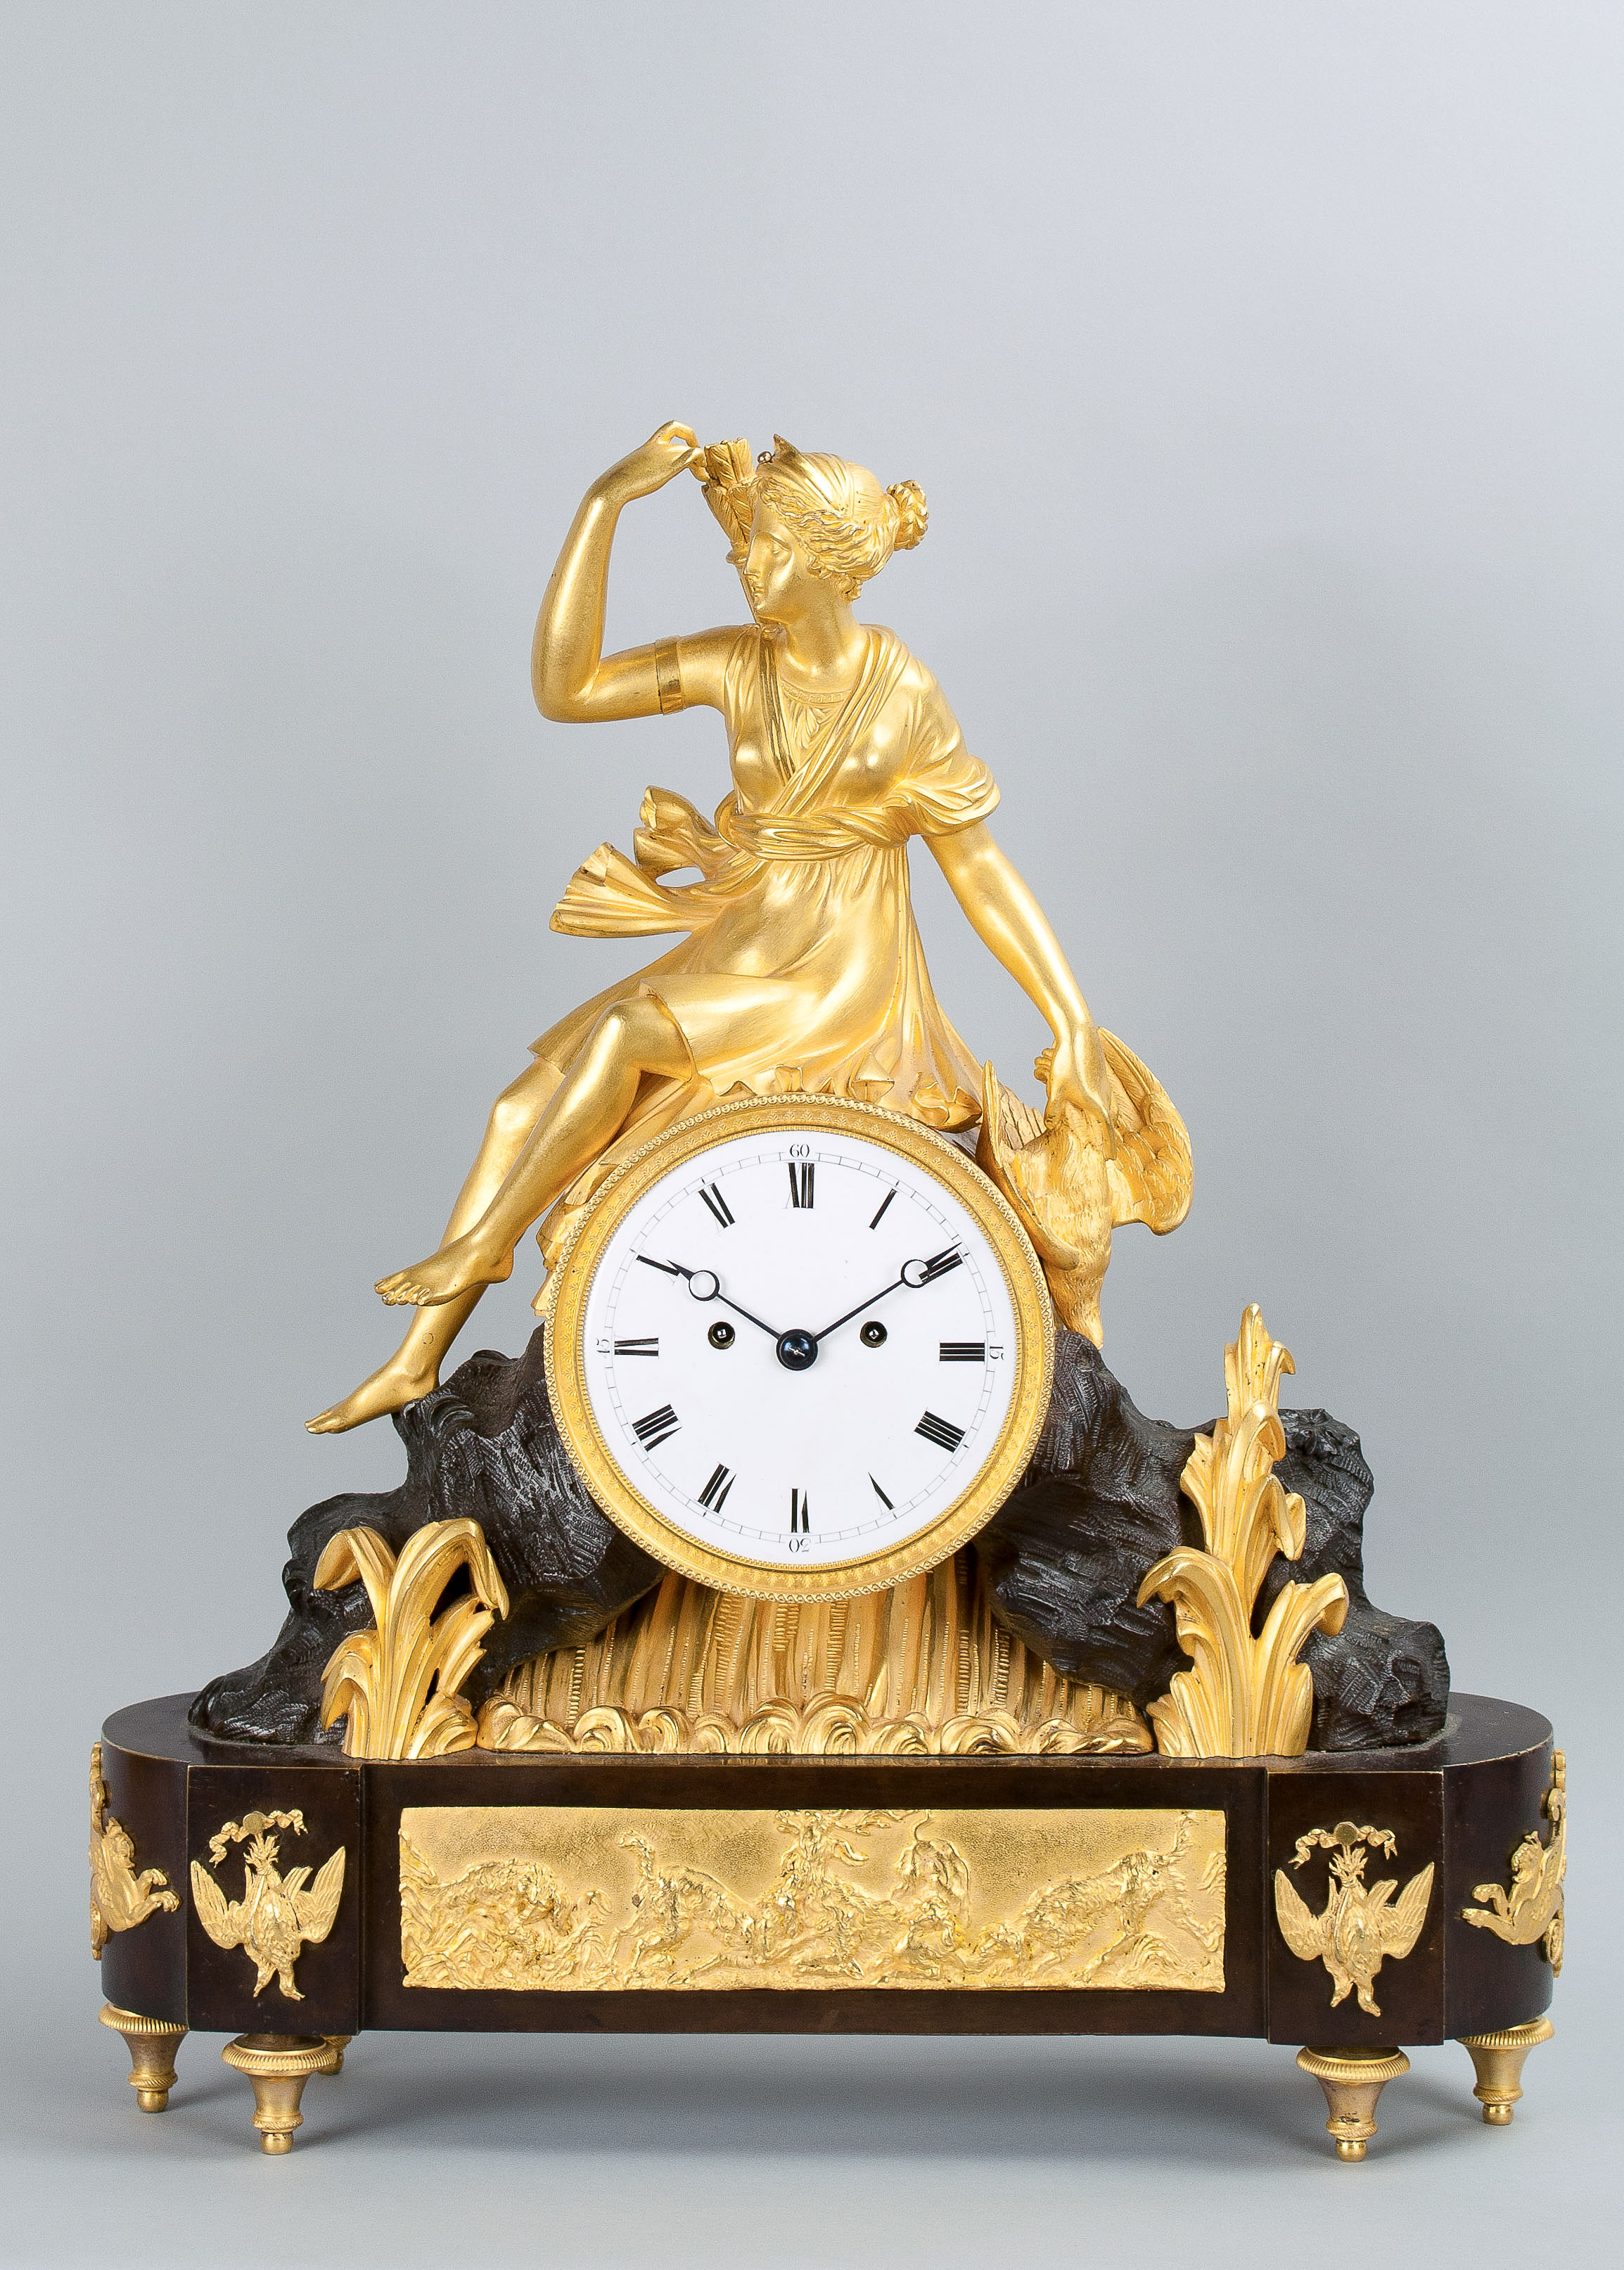 Story Antique Clocks image (6 of 11)